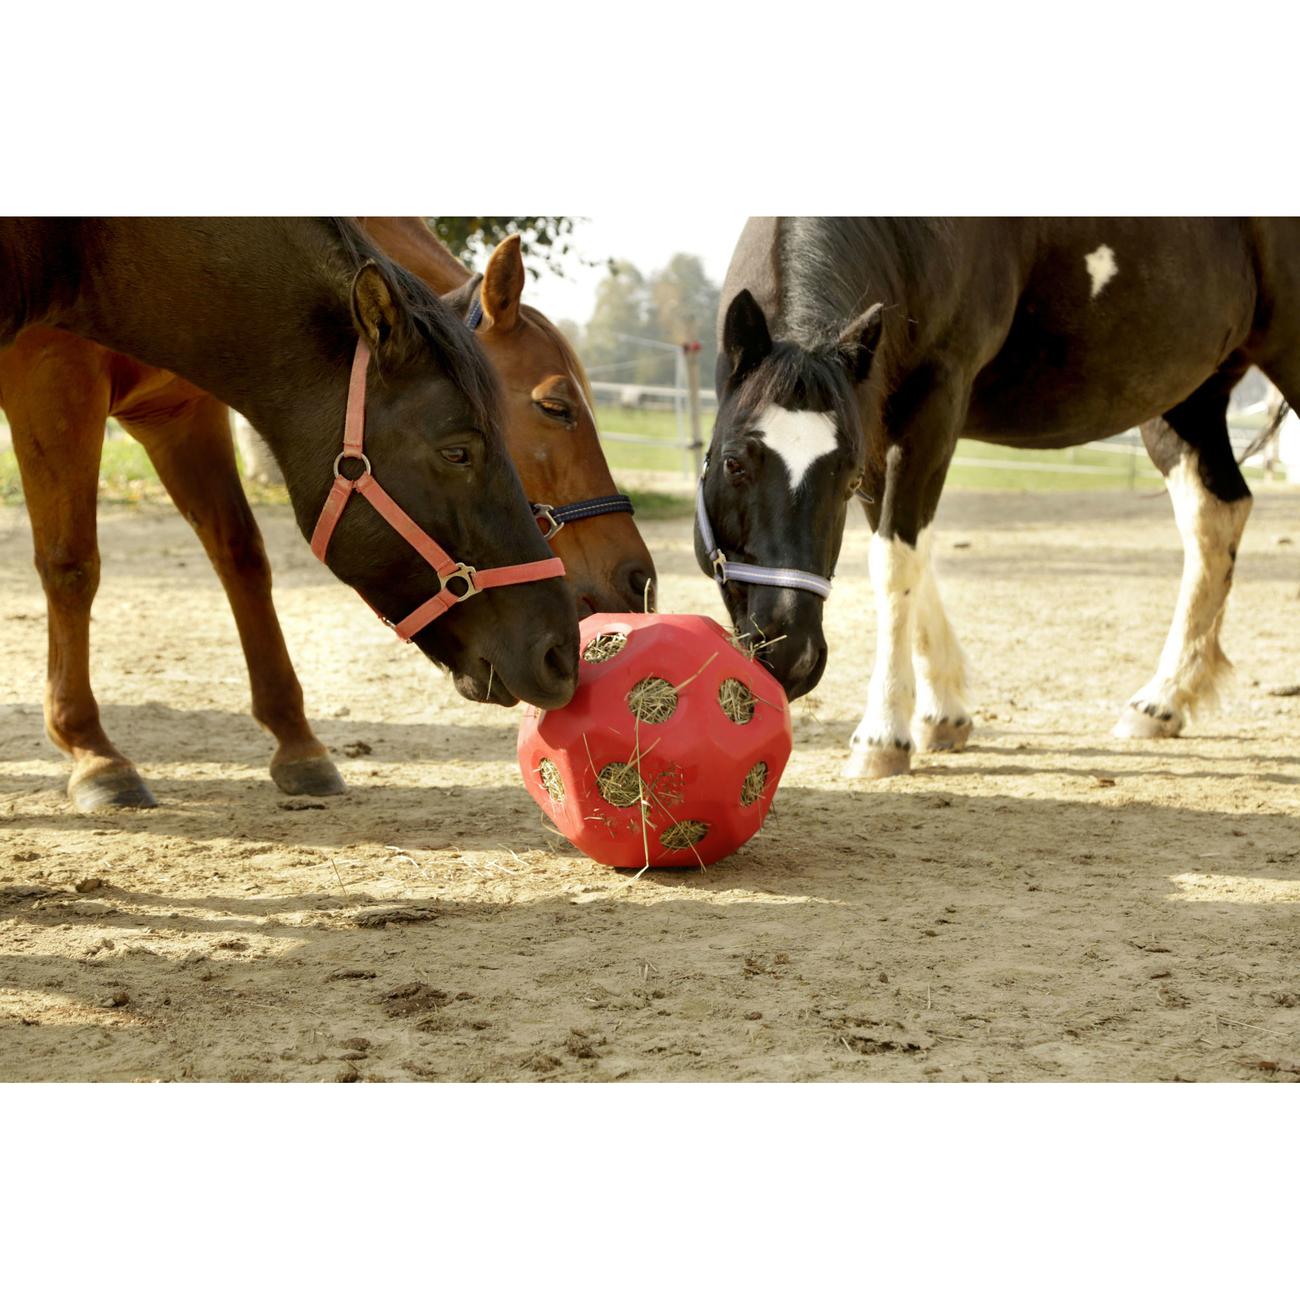 Kerbl HeuBoy Futterspielball für Pferde, Bild 2